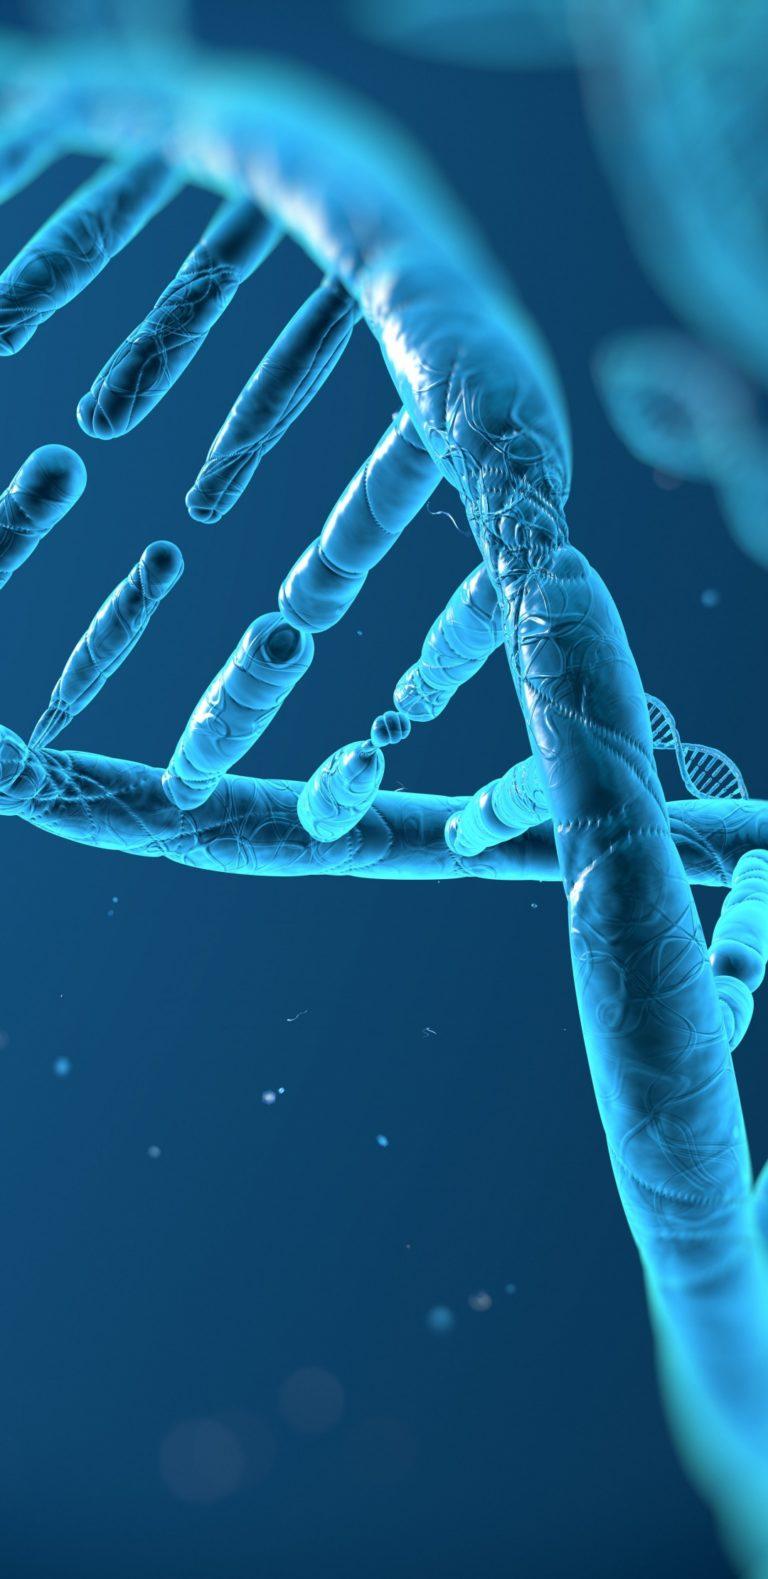 DNA 3D Structure Molecule Pattern 1080x2220 768x1579